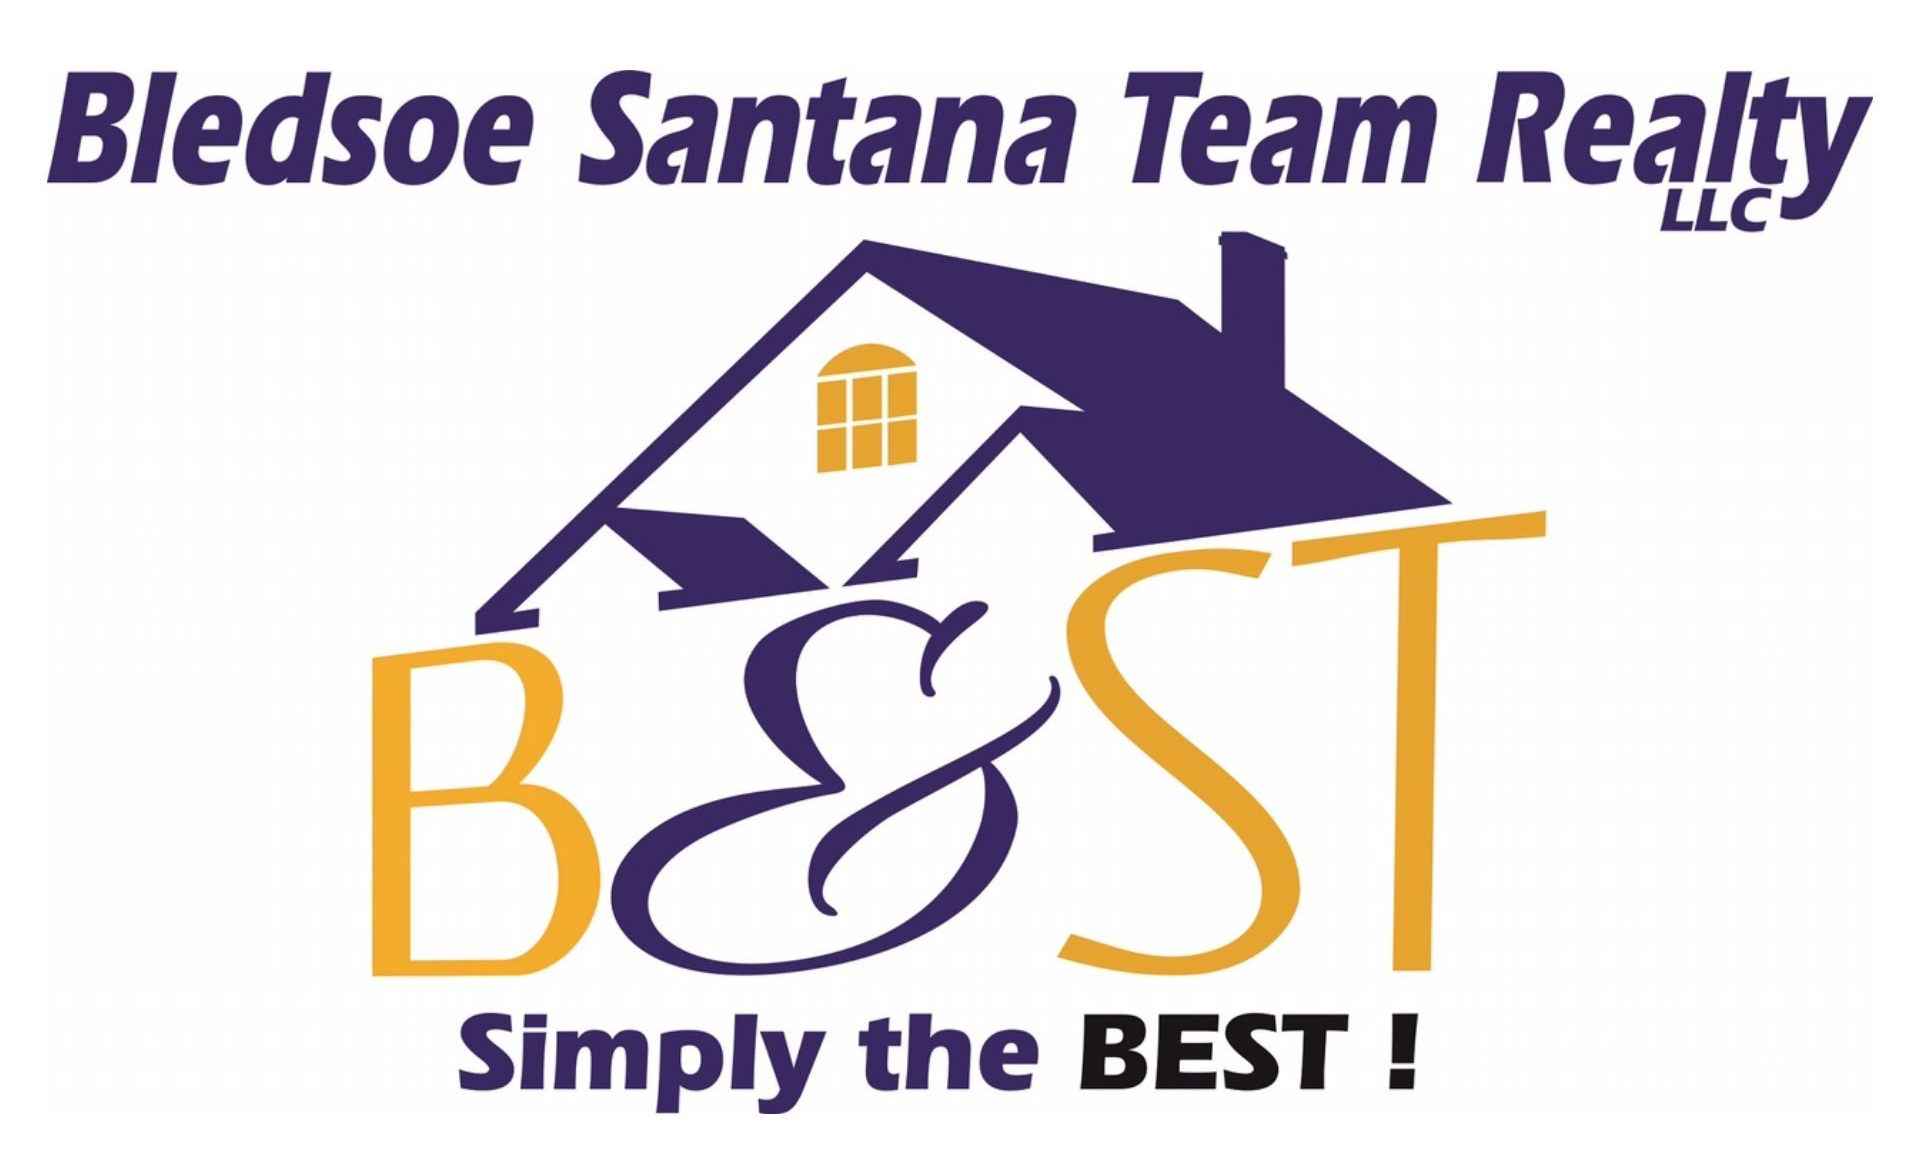 Bledsoe Santana Team Realty LLC Logo